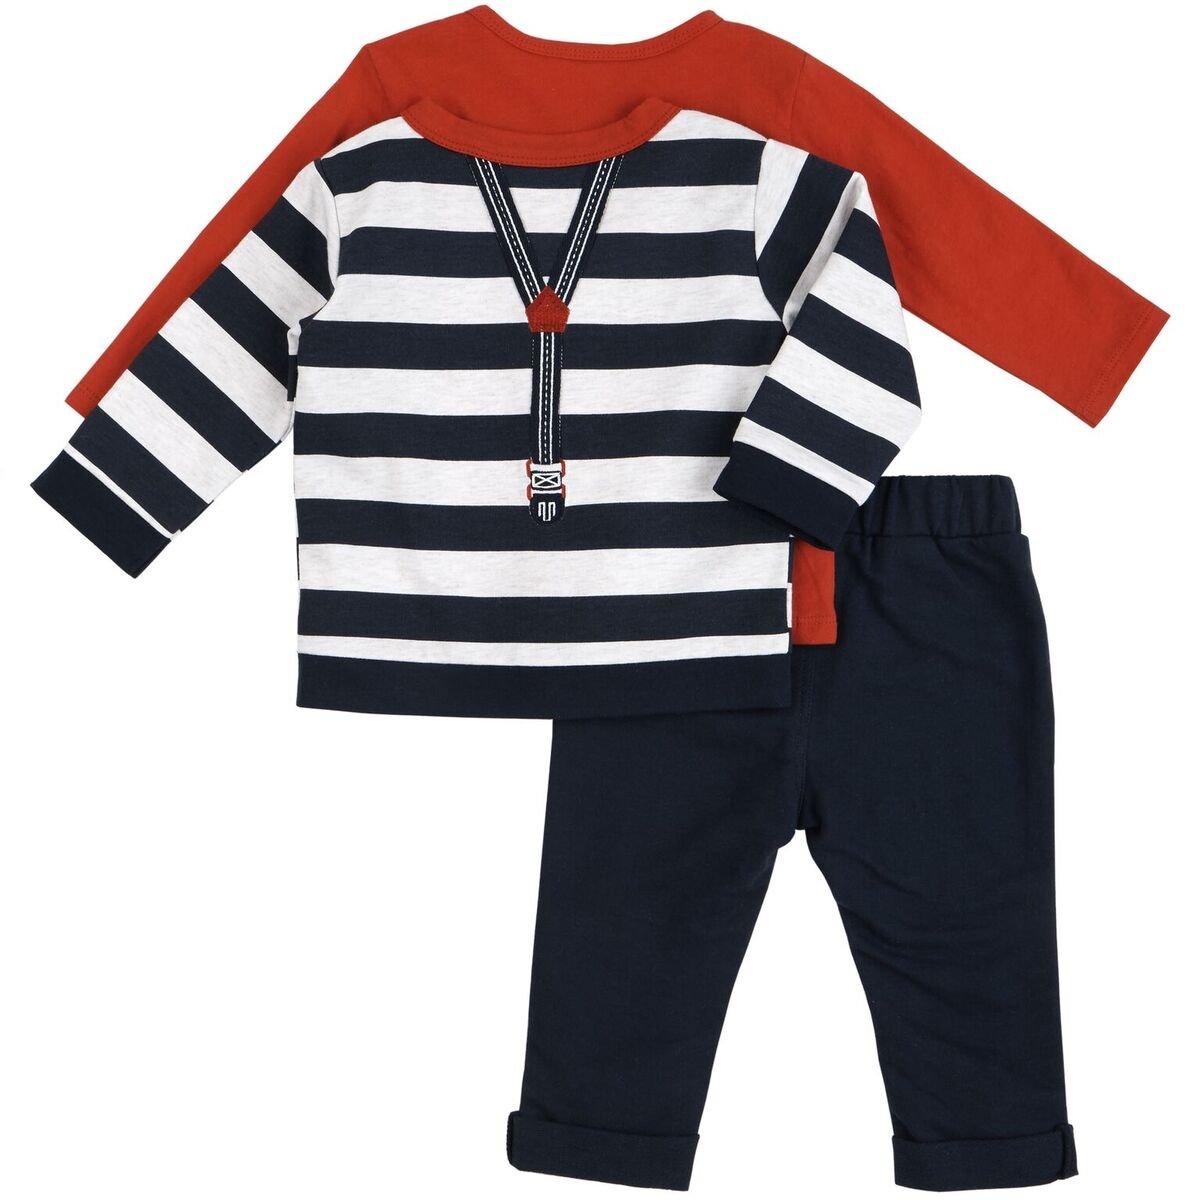 Petit Lem Baby Boys' 3pc Set, Holiday, 6 Months